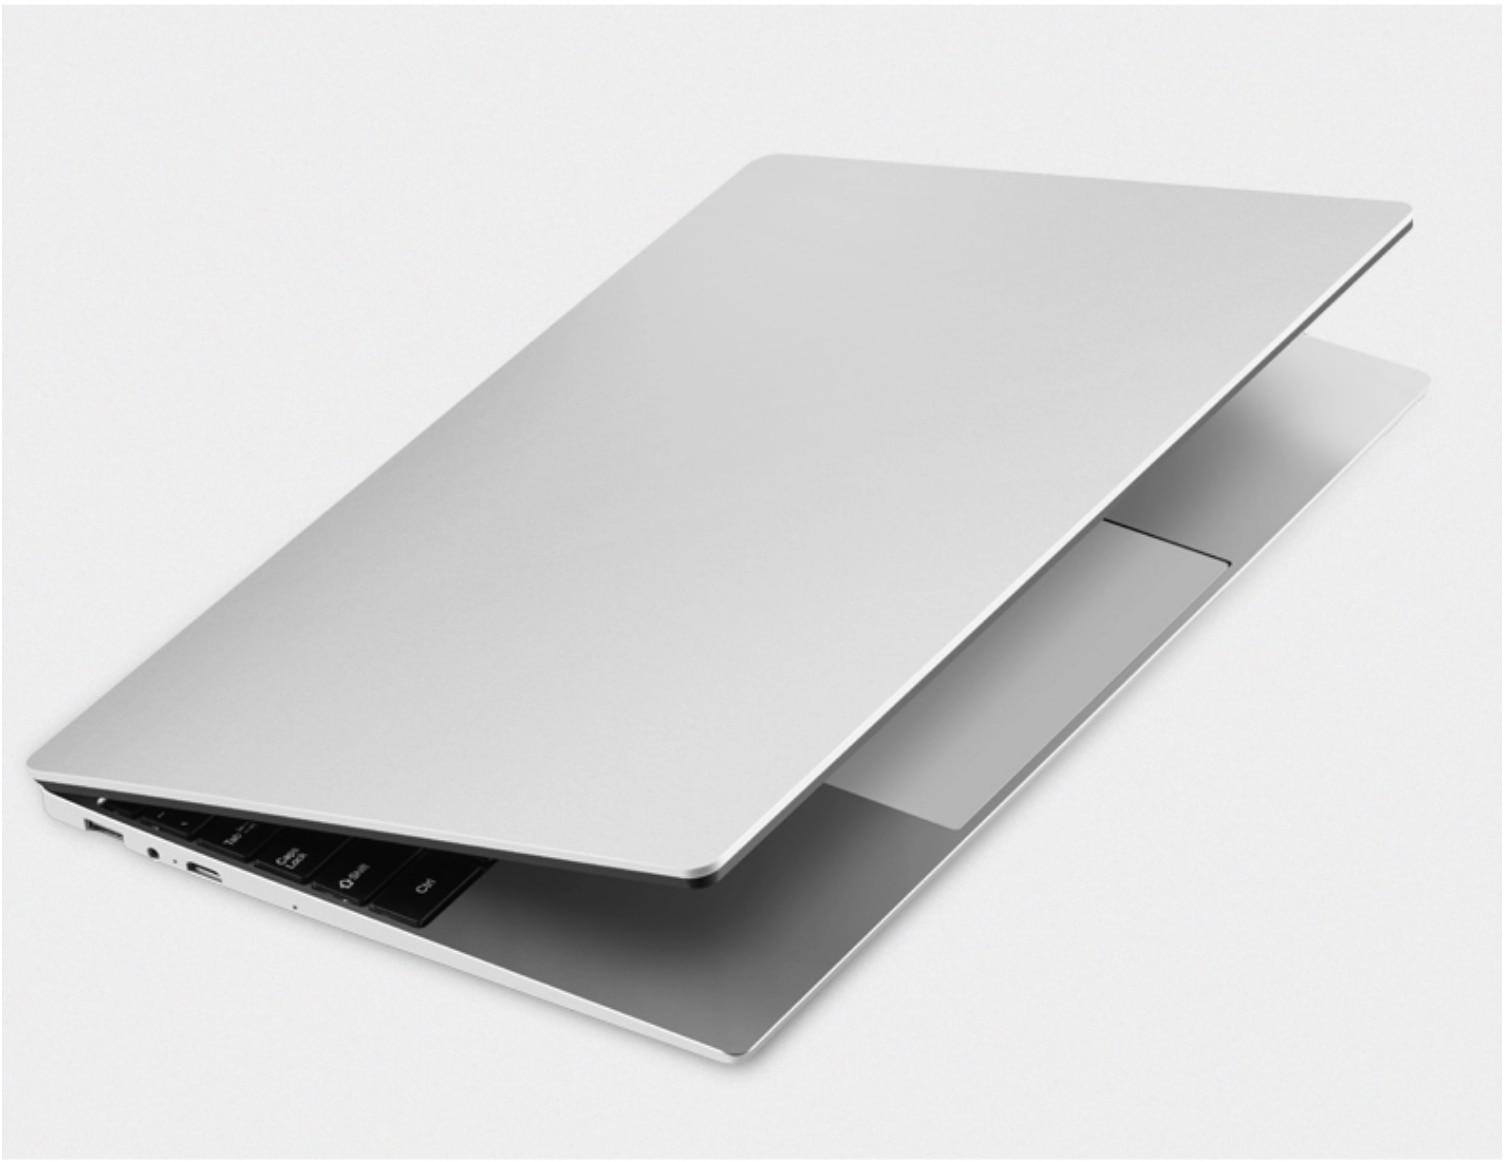 "Notebook 13.3 ""intel core i5-6200U cpu 8 gb ddr4 ram ultralight portátil 1 gb gddr5 sdram dedicado cartão"